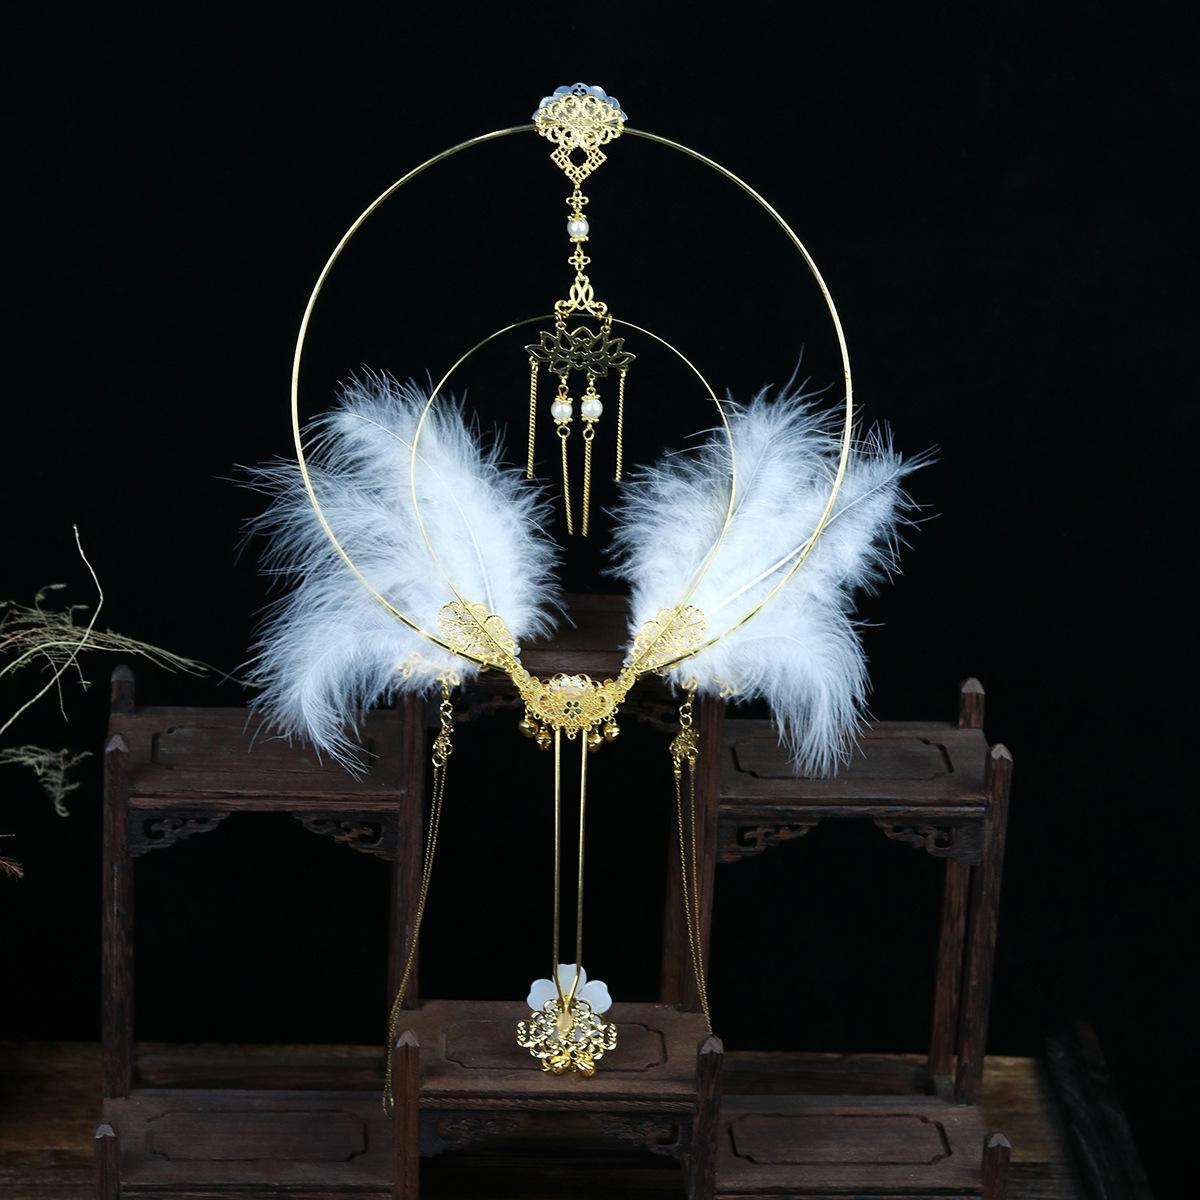 [feather wings] ancient style, original handwork, Hanfu ornament, Lolita, accessories, feather fan, hollow flower, fan girl